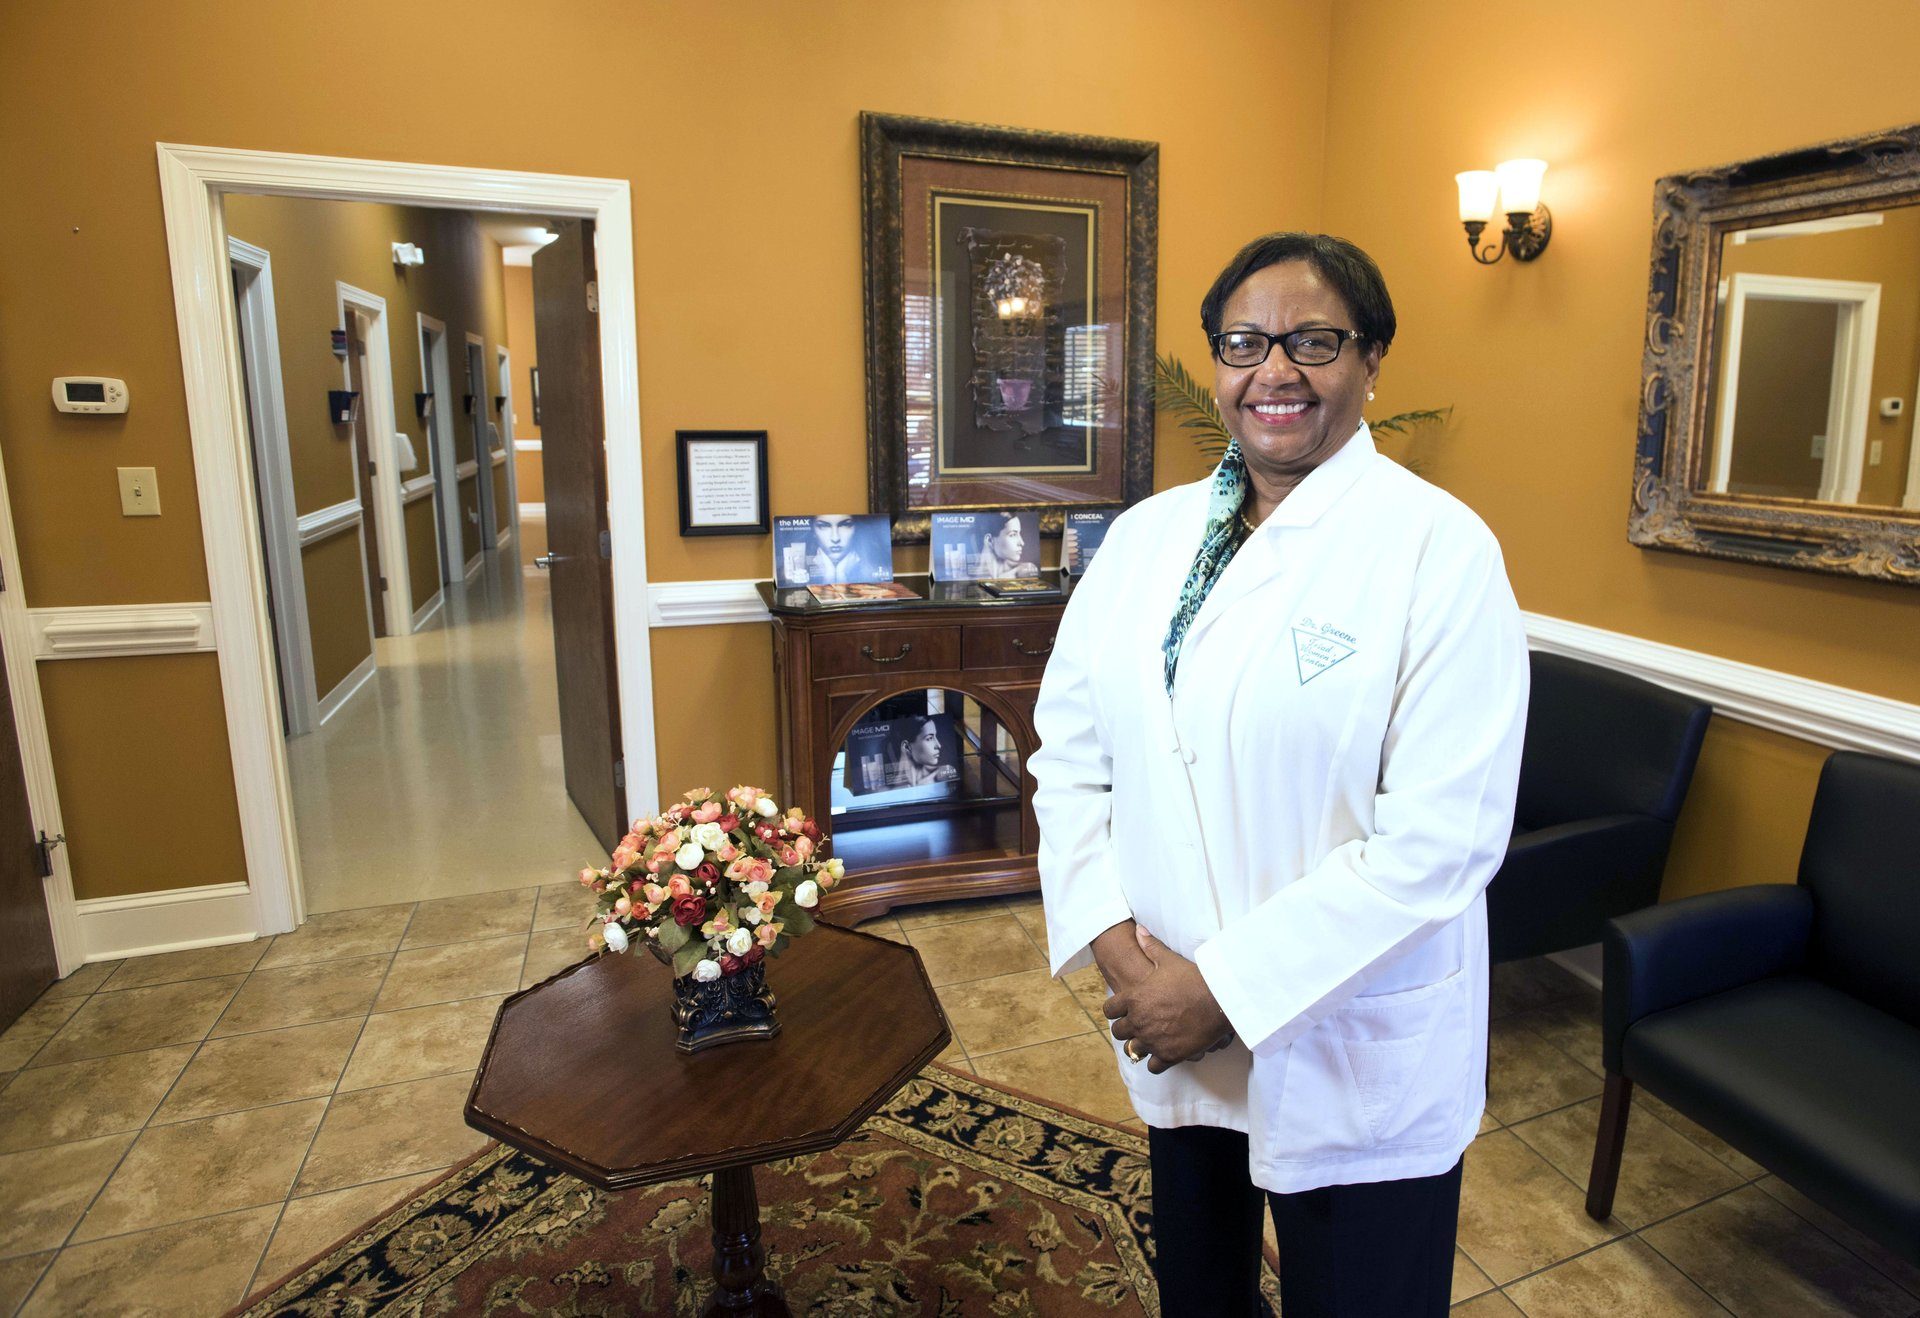 Dr. Greene of women's health center in High Point